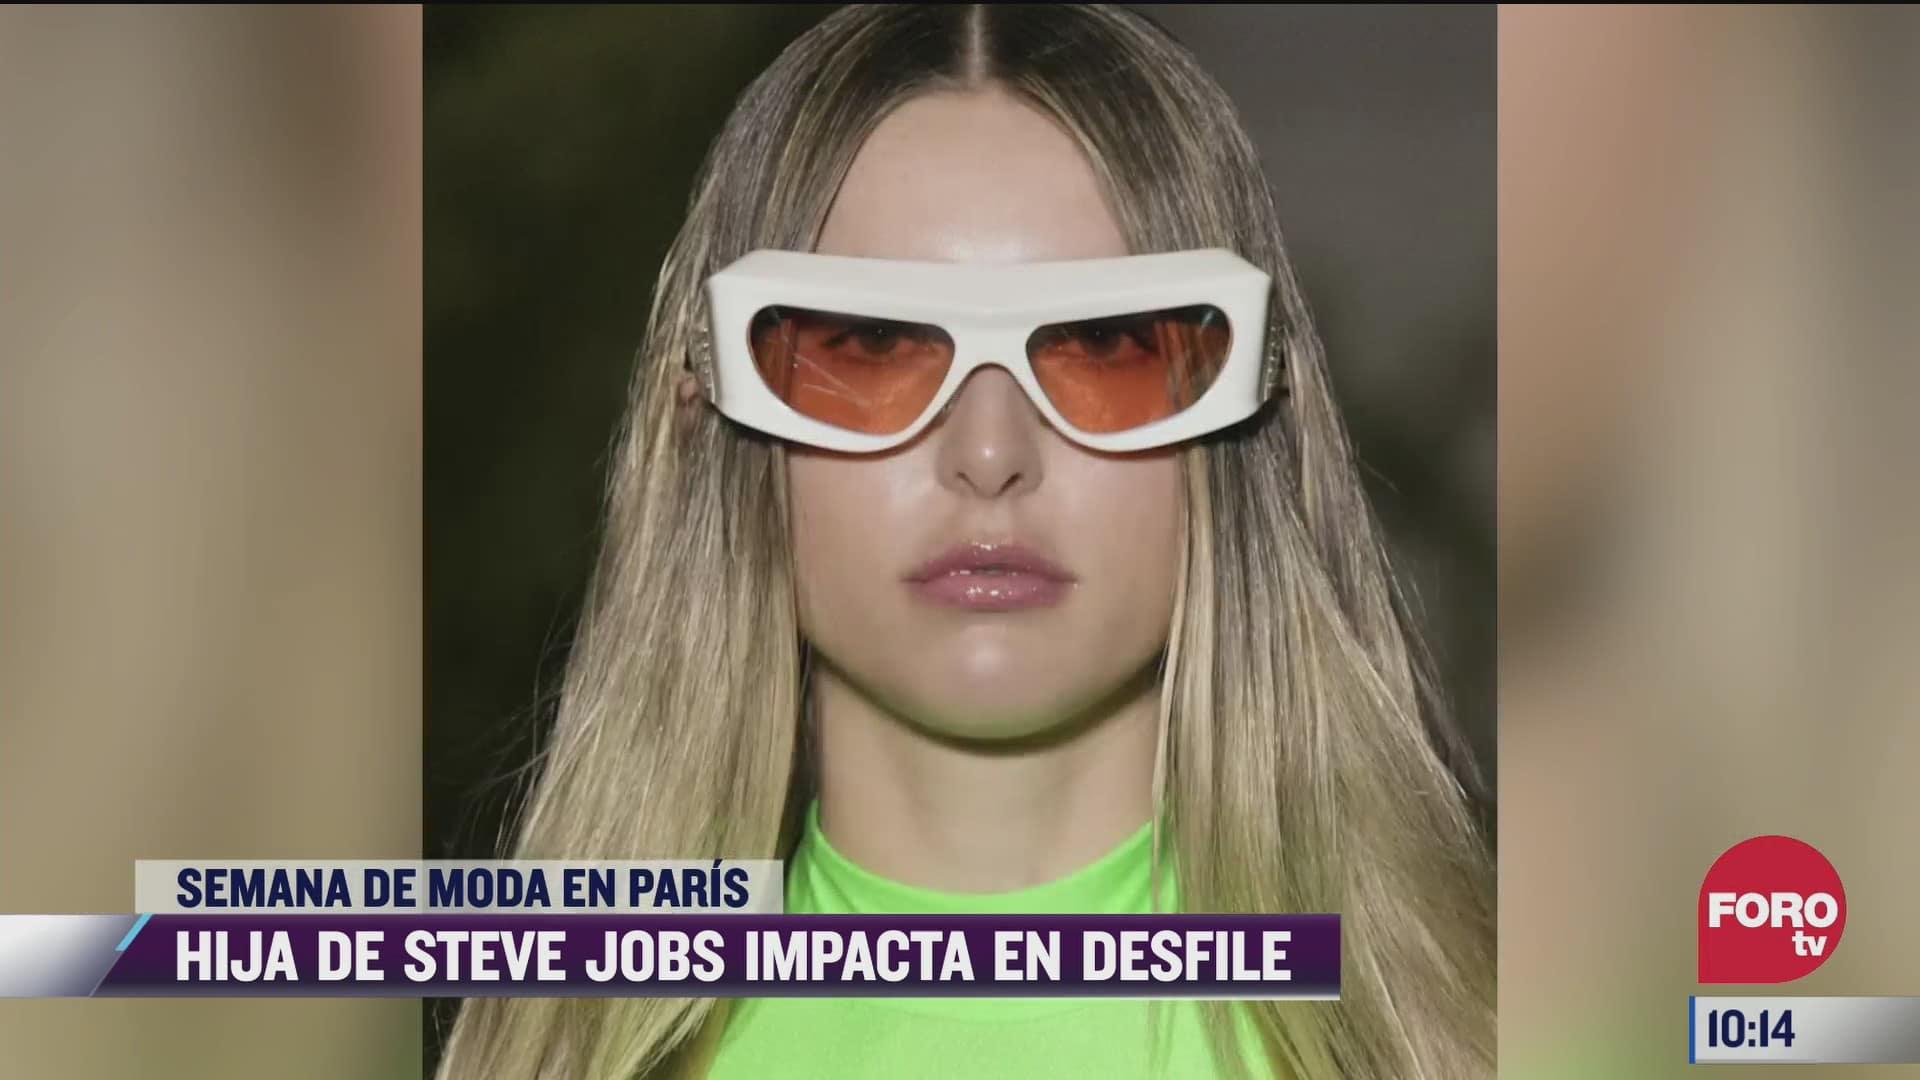 hija de steve jobs deslumbra durante desfile de moda en paris